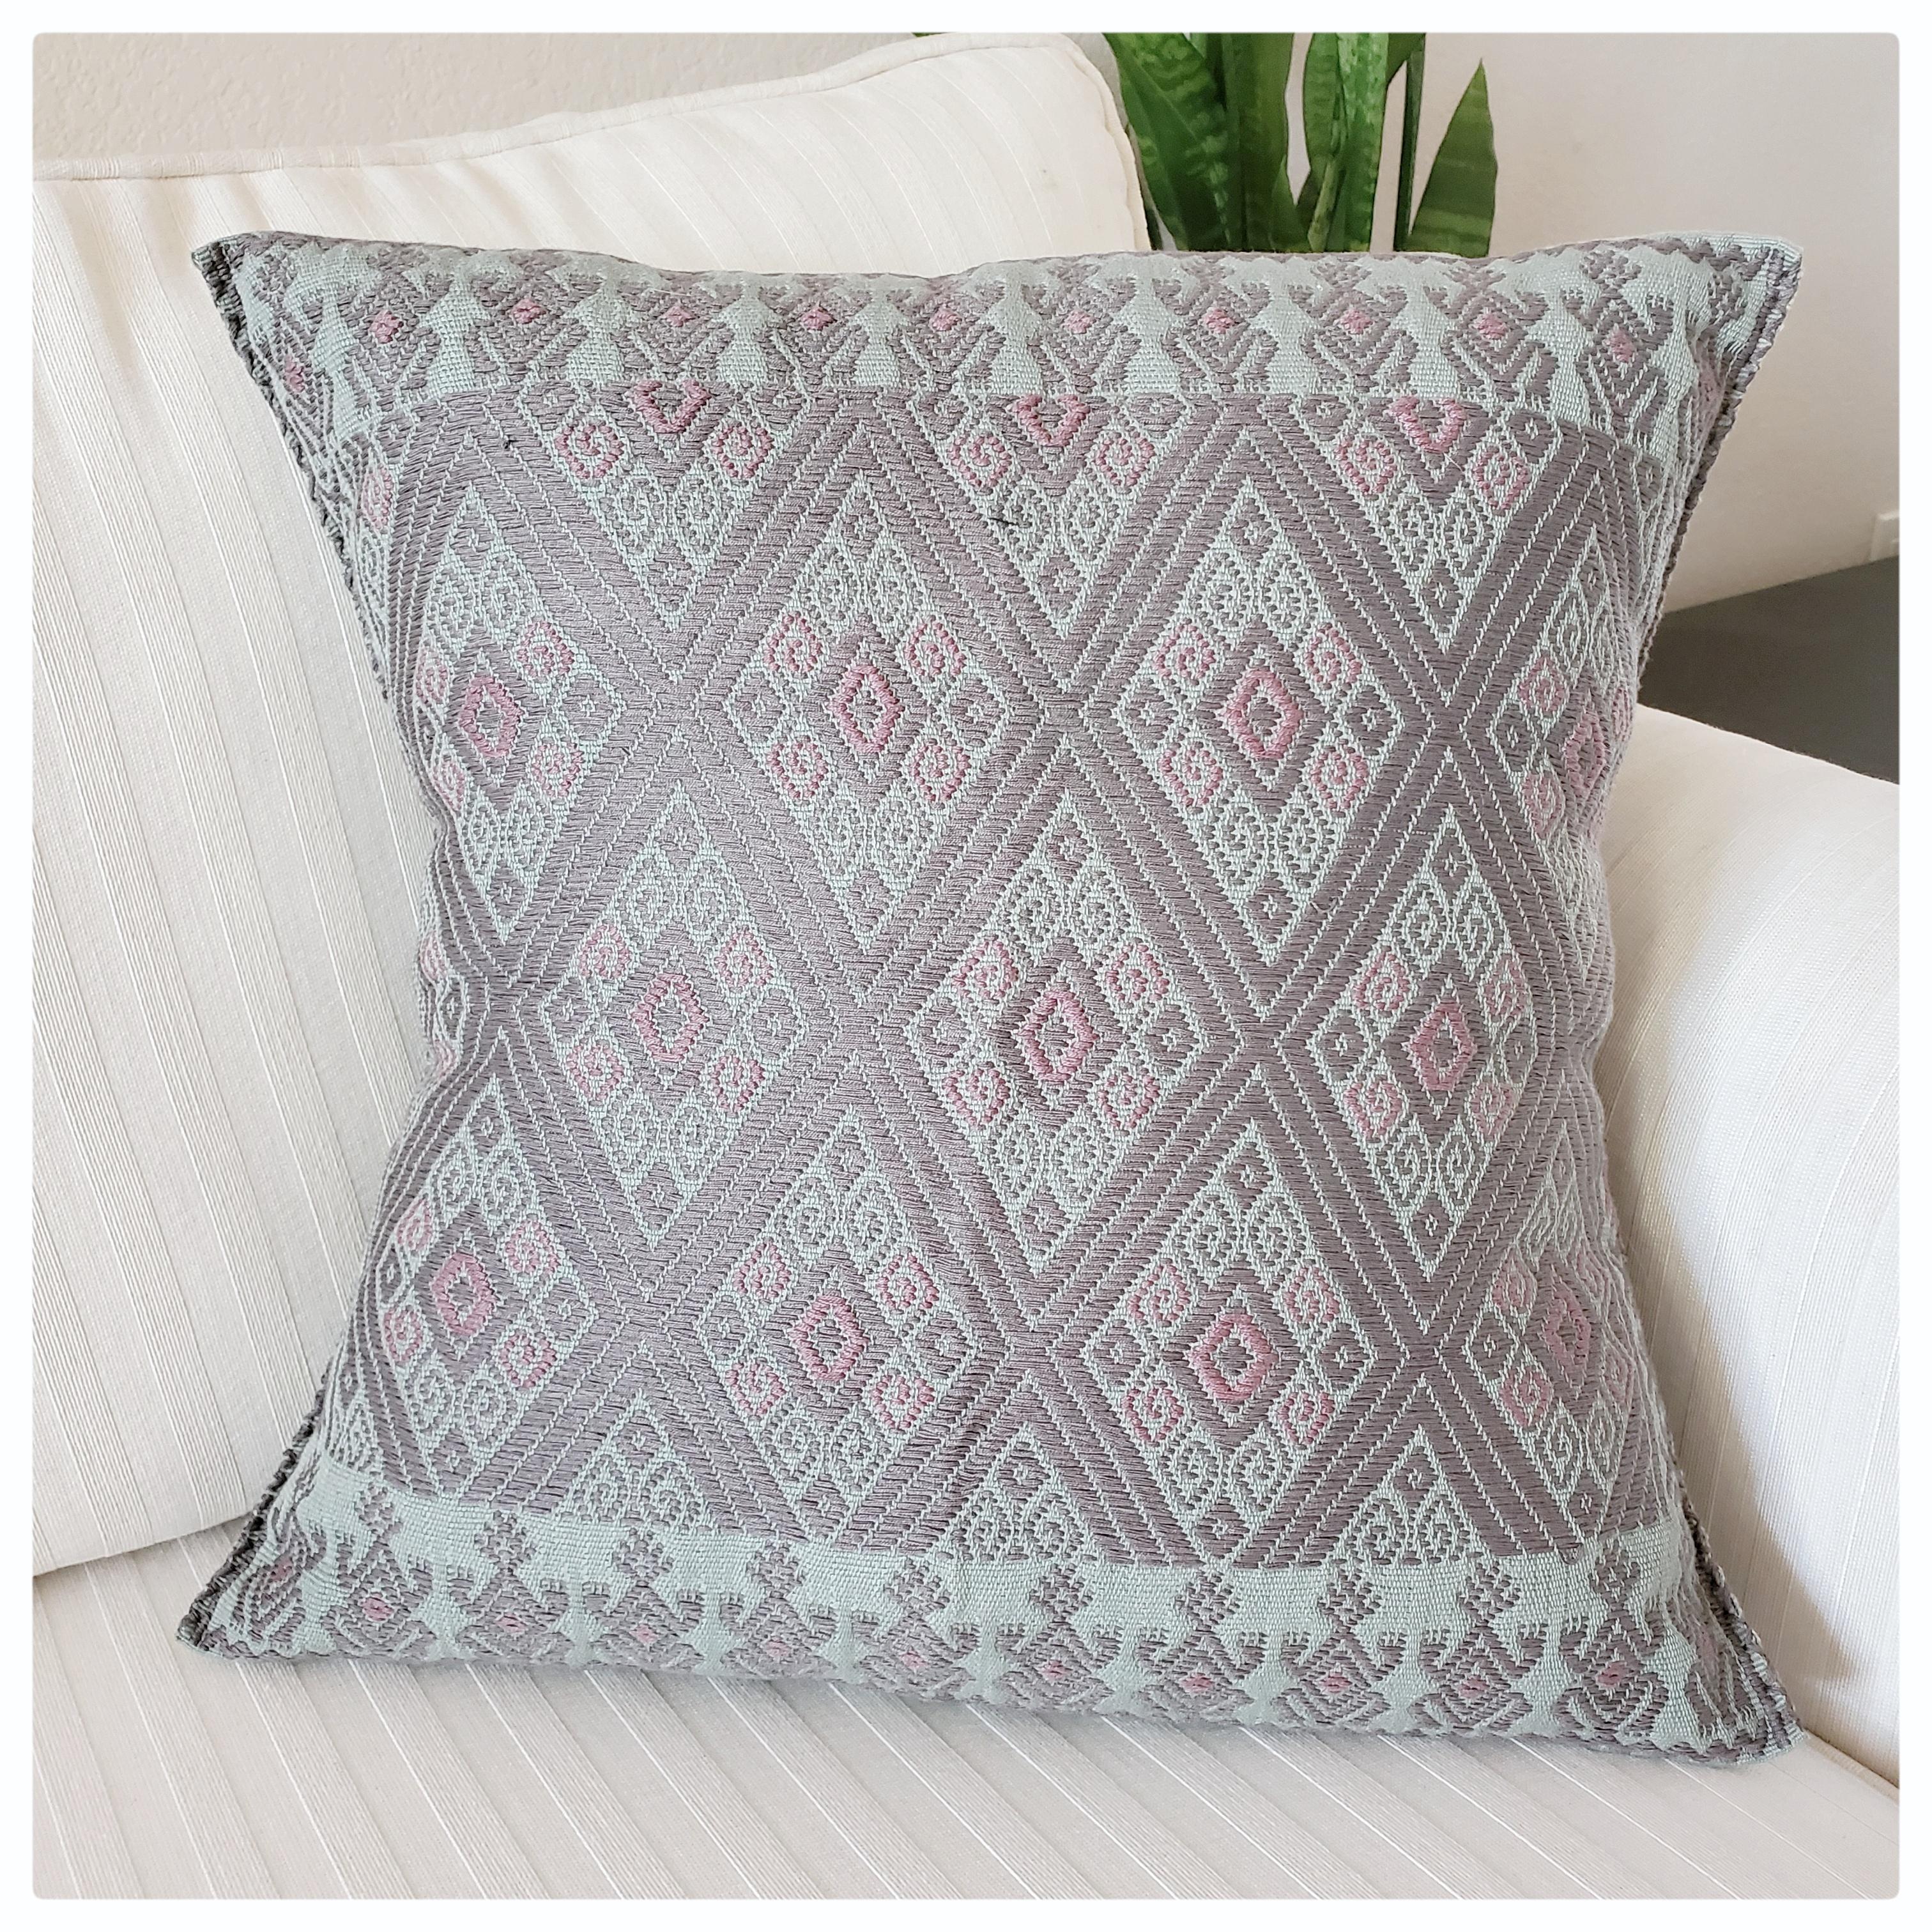 San Andres Larrairzar textile, maya hand woven, mexican pillow, mexican textile, maya mexican